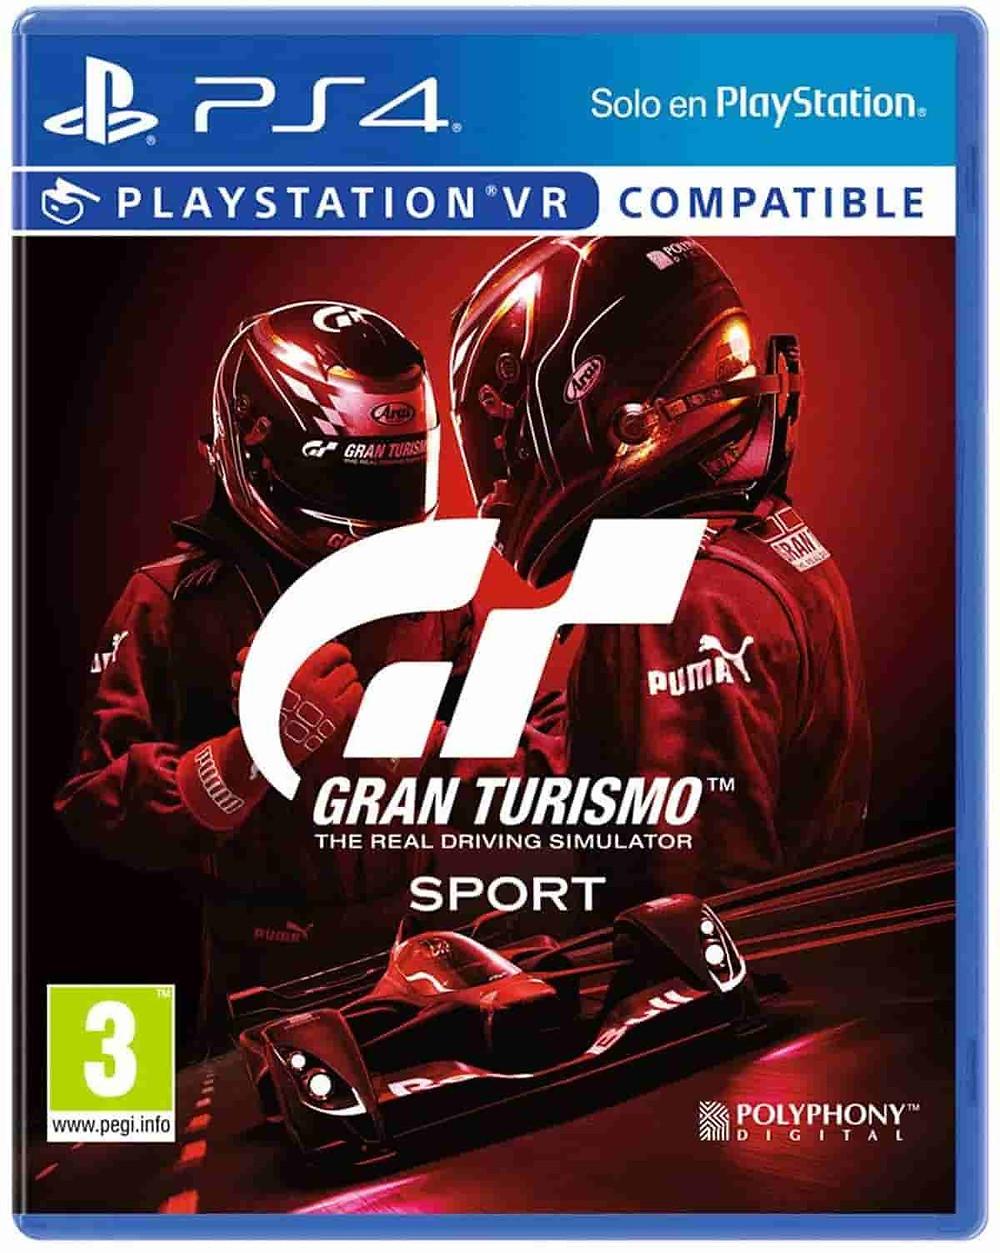 Juego imprescindible ps4: Gran Turismo Sport Spec II